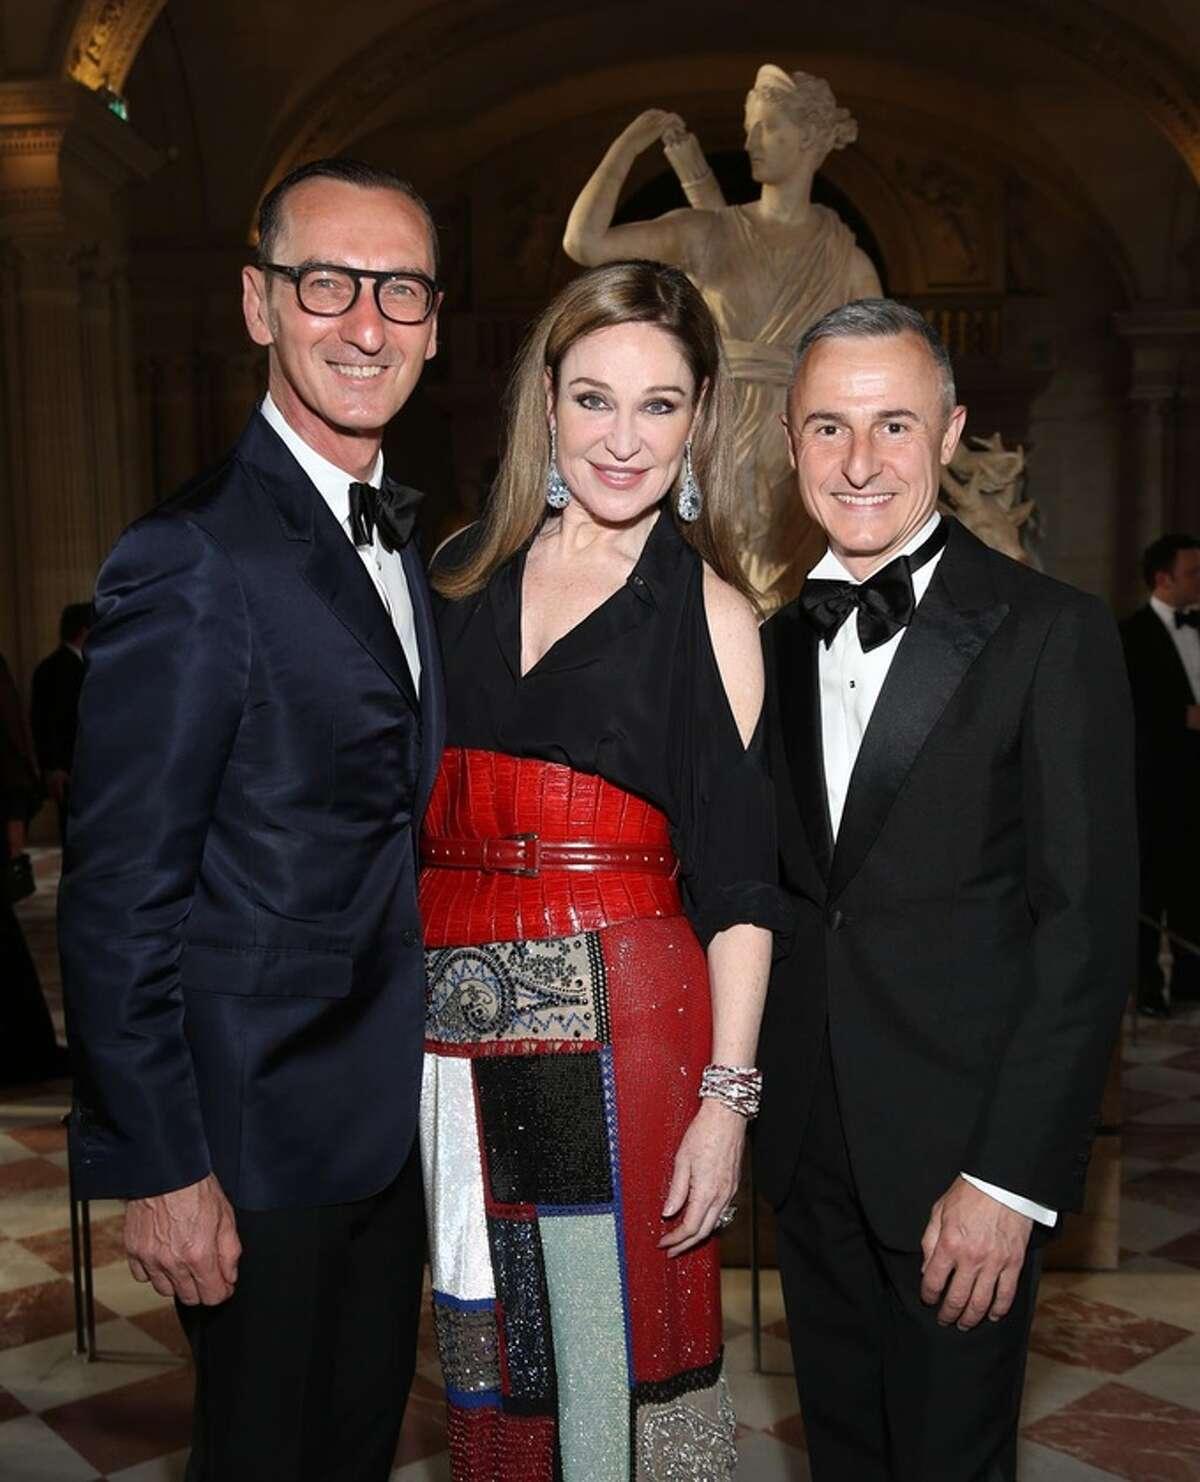 Bruno Frisoni, left, Becca Cason Thrash and Herve Van der Straeten